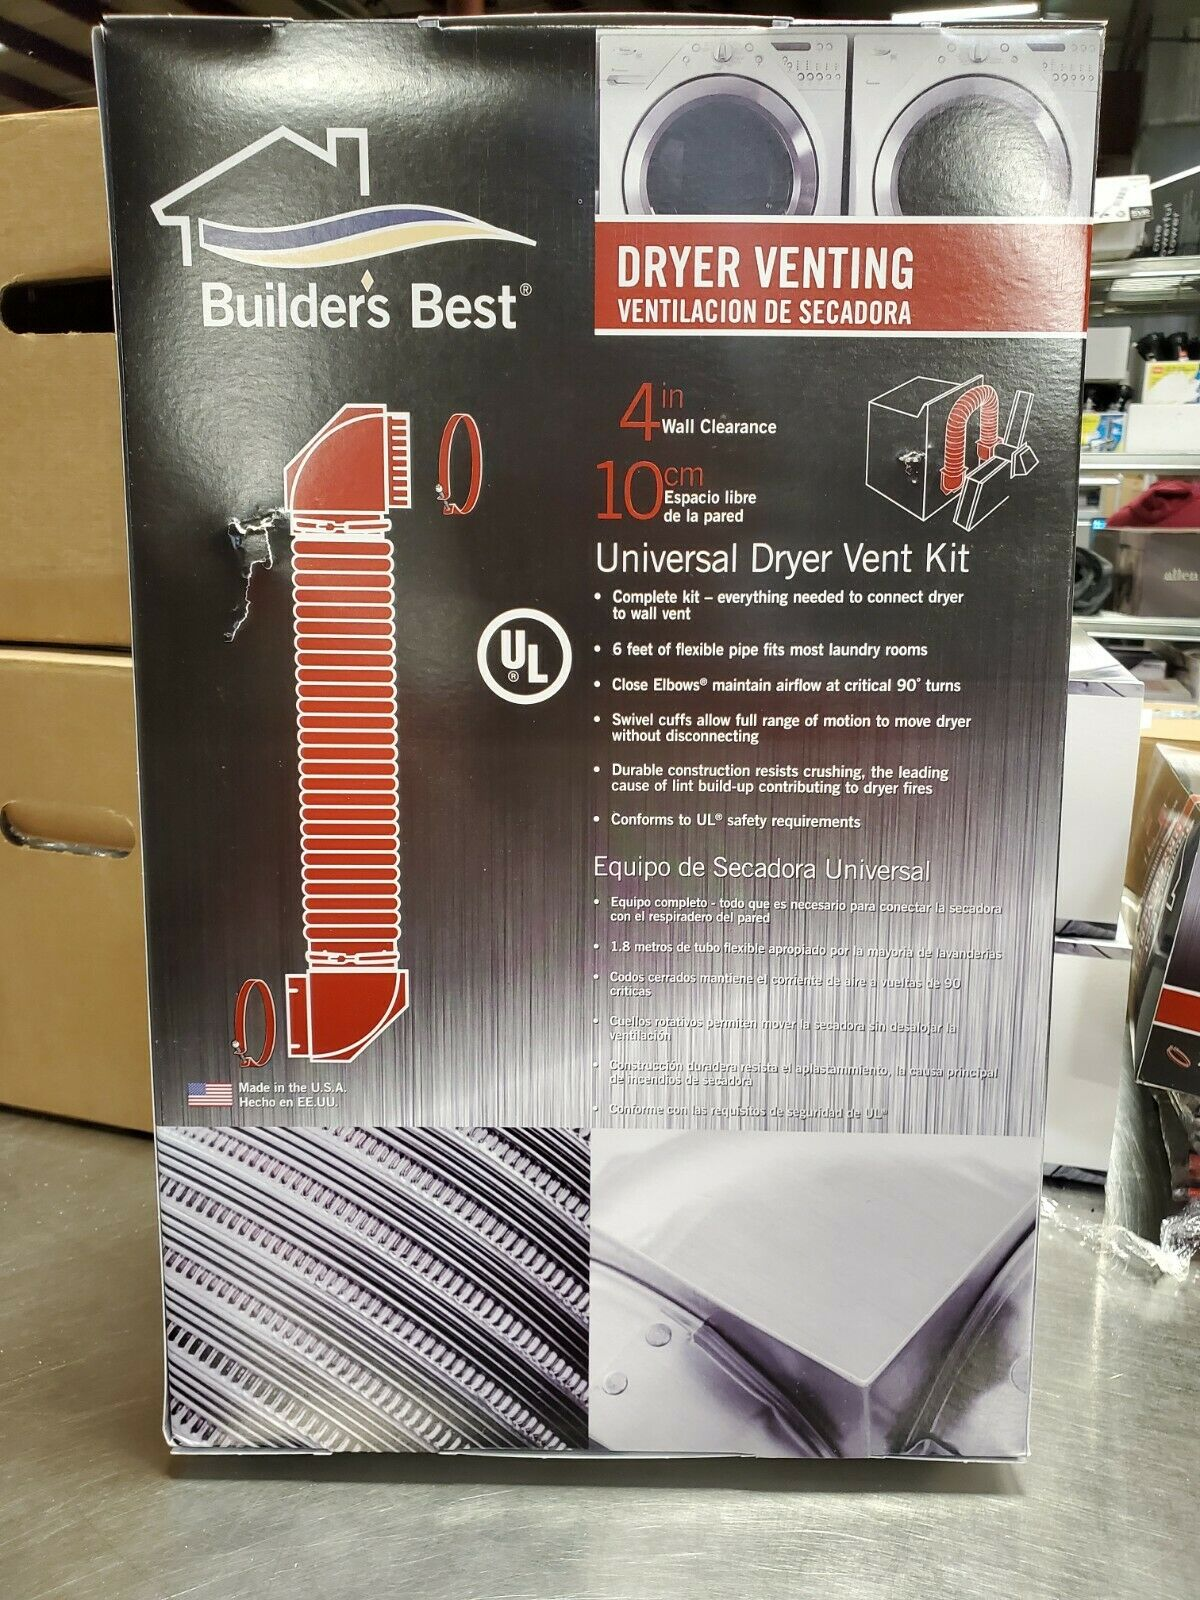 Builders Best 080117 Universal Dryer Vent Kit